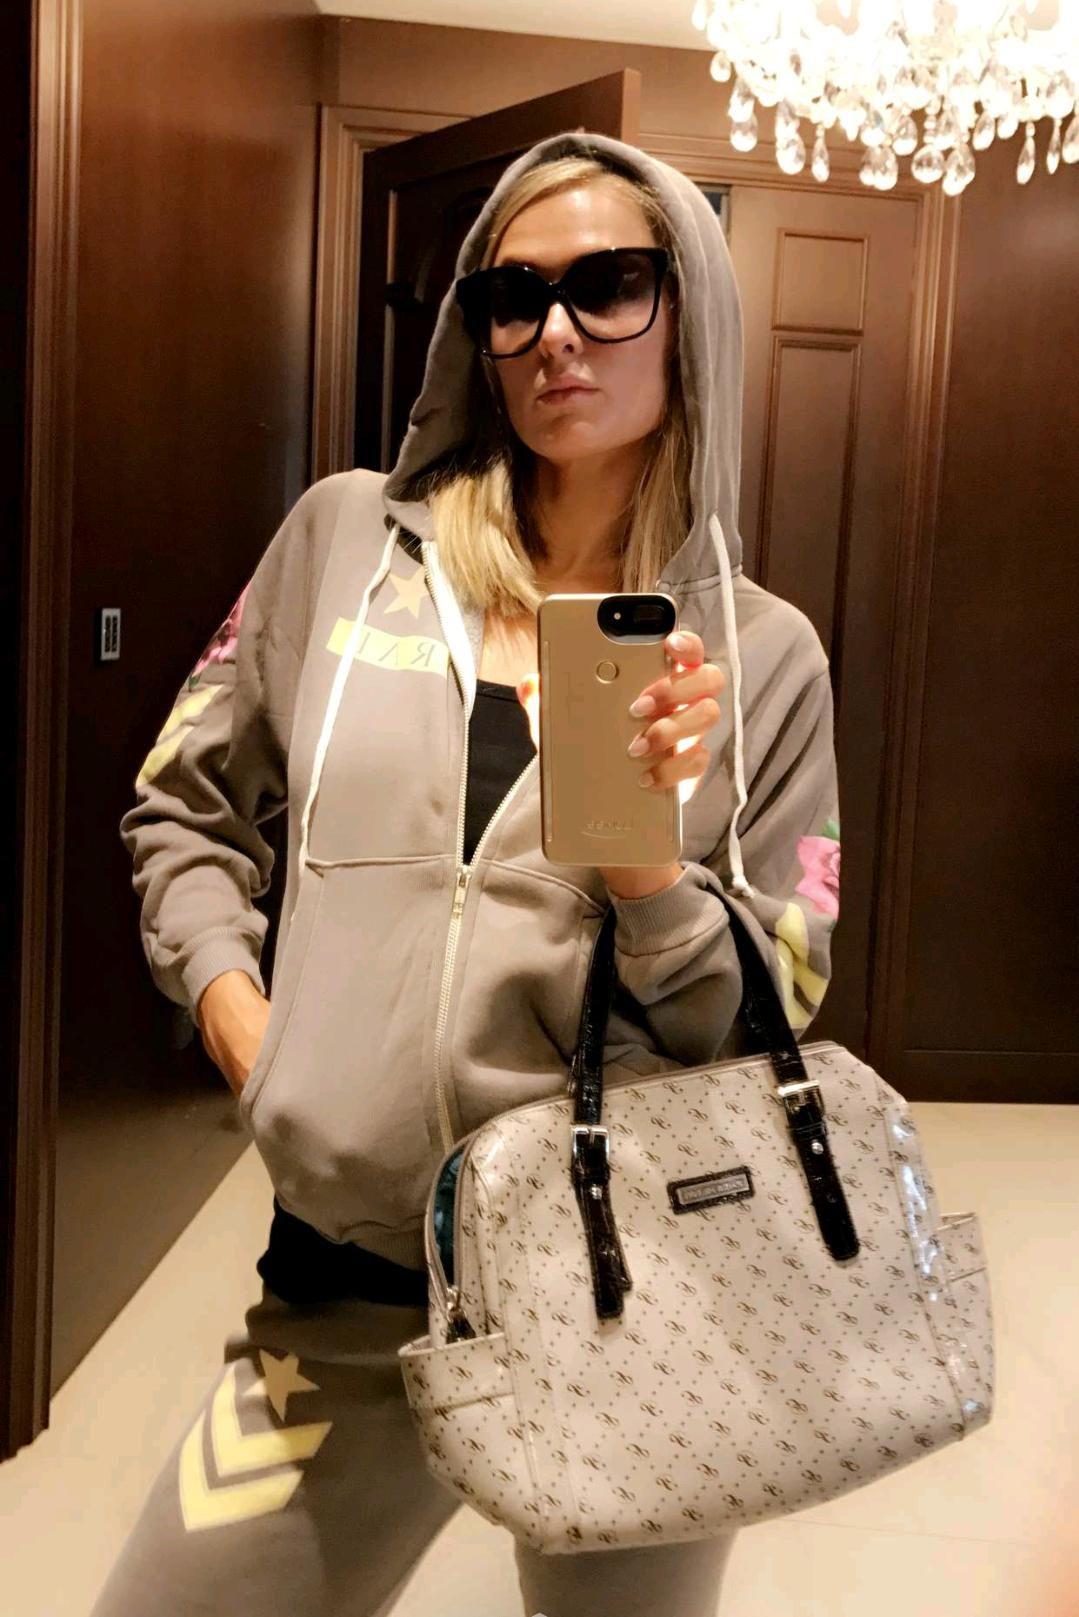 aad512538b7 Paris Hilton wearing Paris Hilton Star-P Boston Bag, Dita Paradis  Sunglasses in Black, Wildfox Couture Rad Regan Zip Hoodie and Wildfox  Couture Rad Fame ...